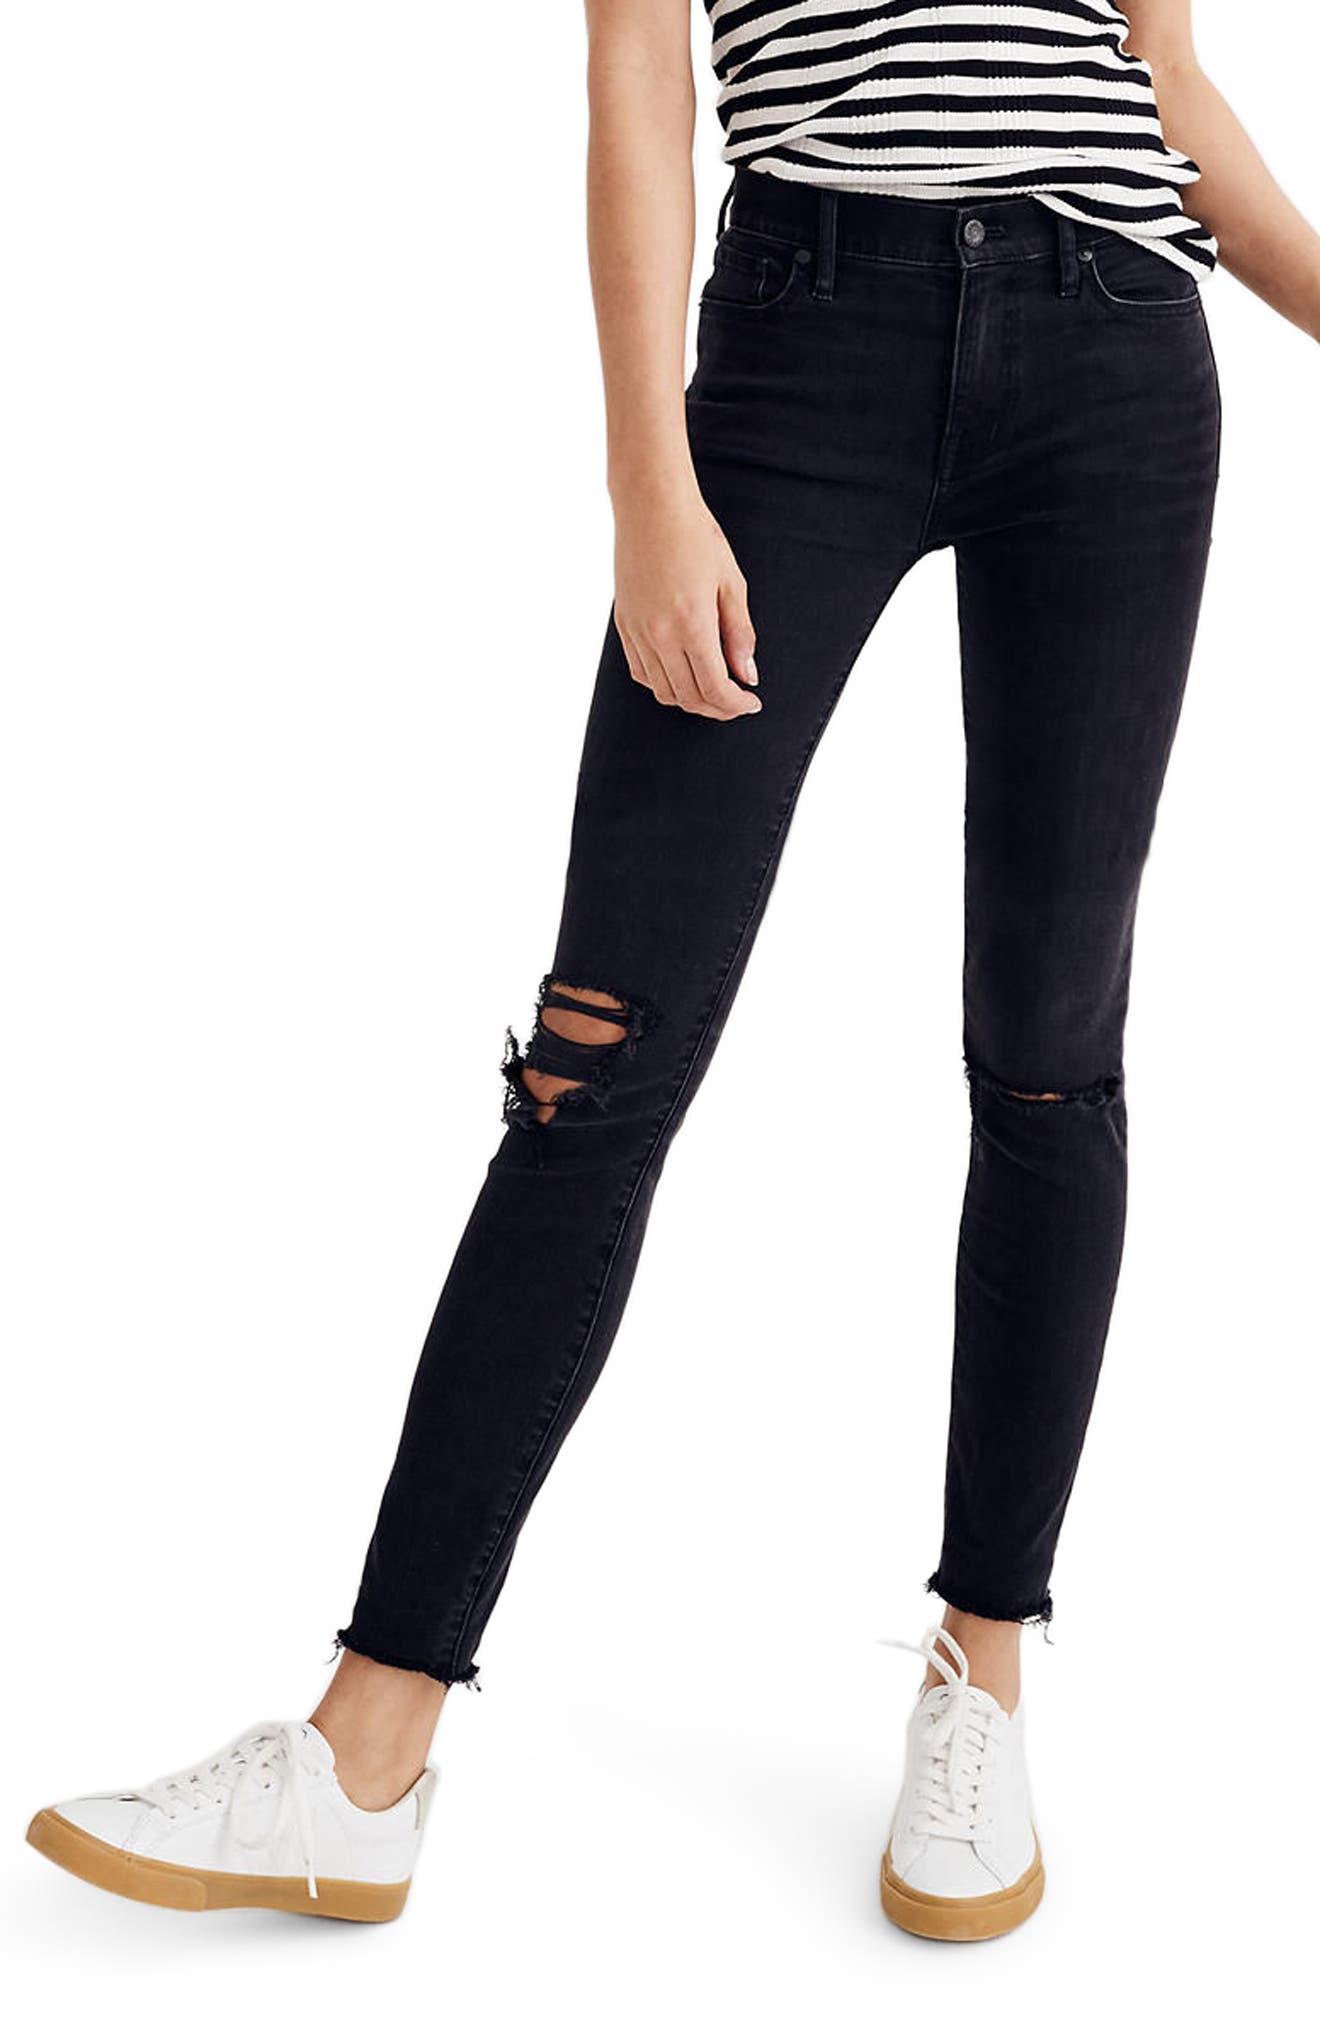 Madewell 9-Inch High Waist Skinny Jeans (Black Sea)